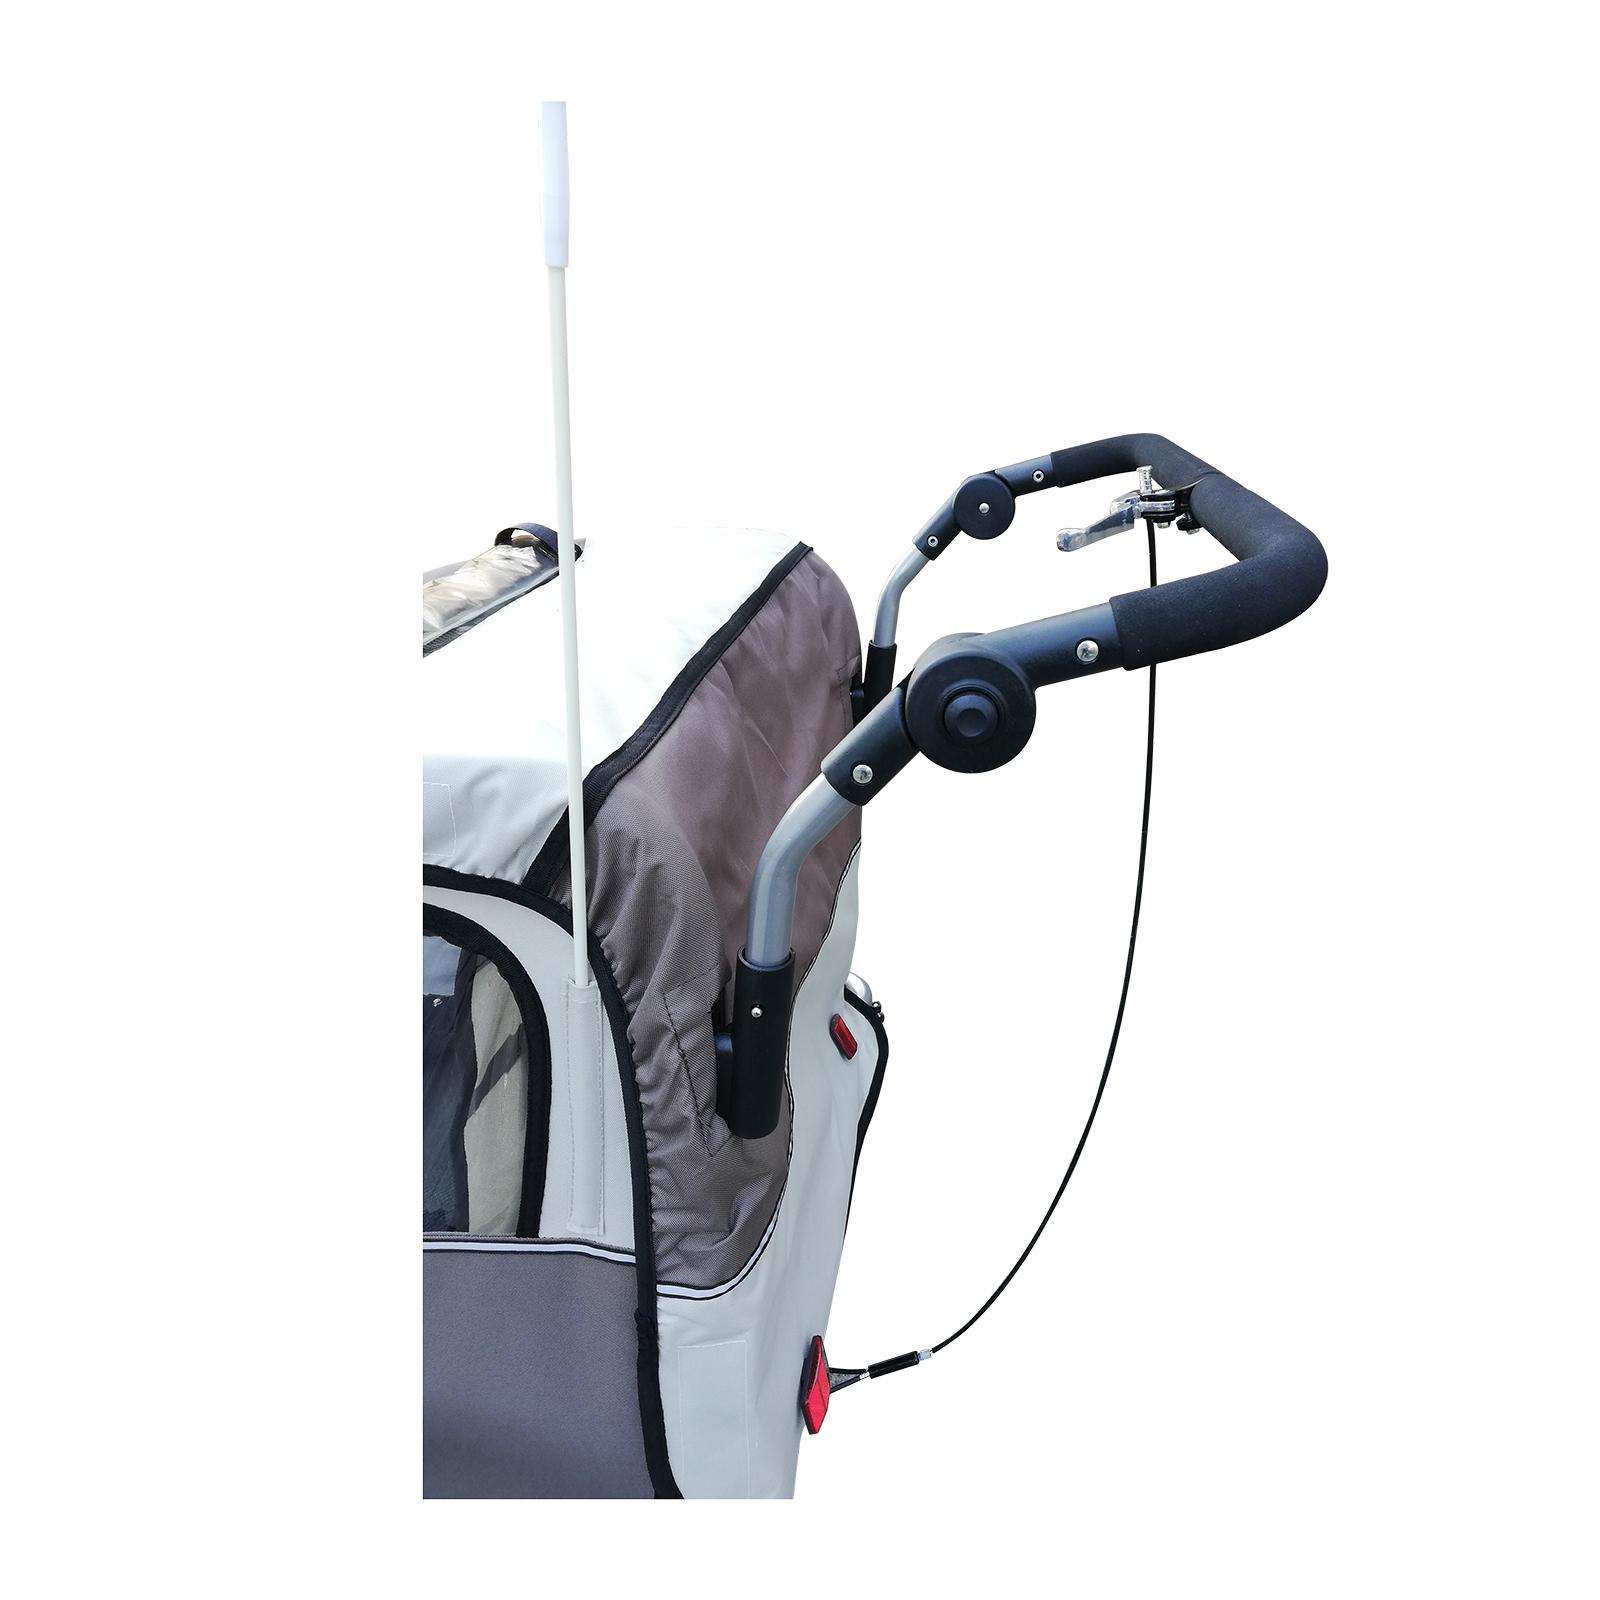 Remolque-Infantil-Bicicleta-2-PLAZAS-Kit-Footing-Rueda-360-Amortiguadores-Barra miniatura 17